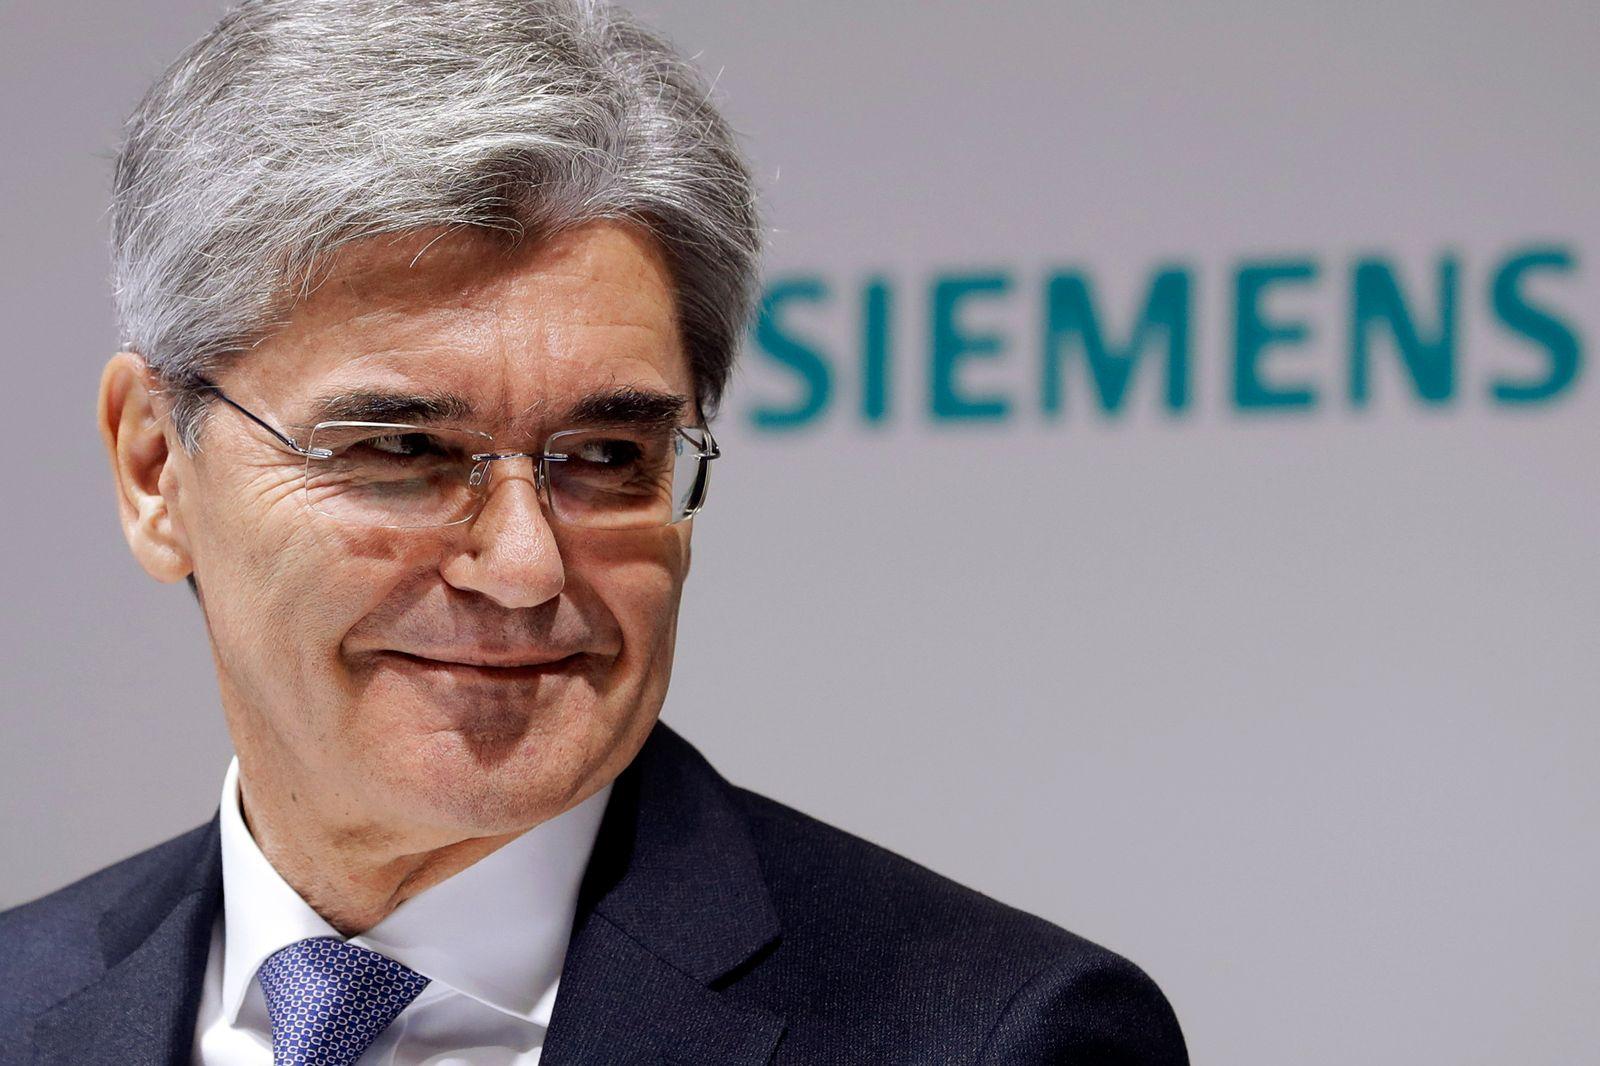 Germany Siemens Earns